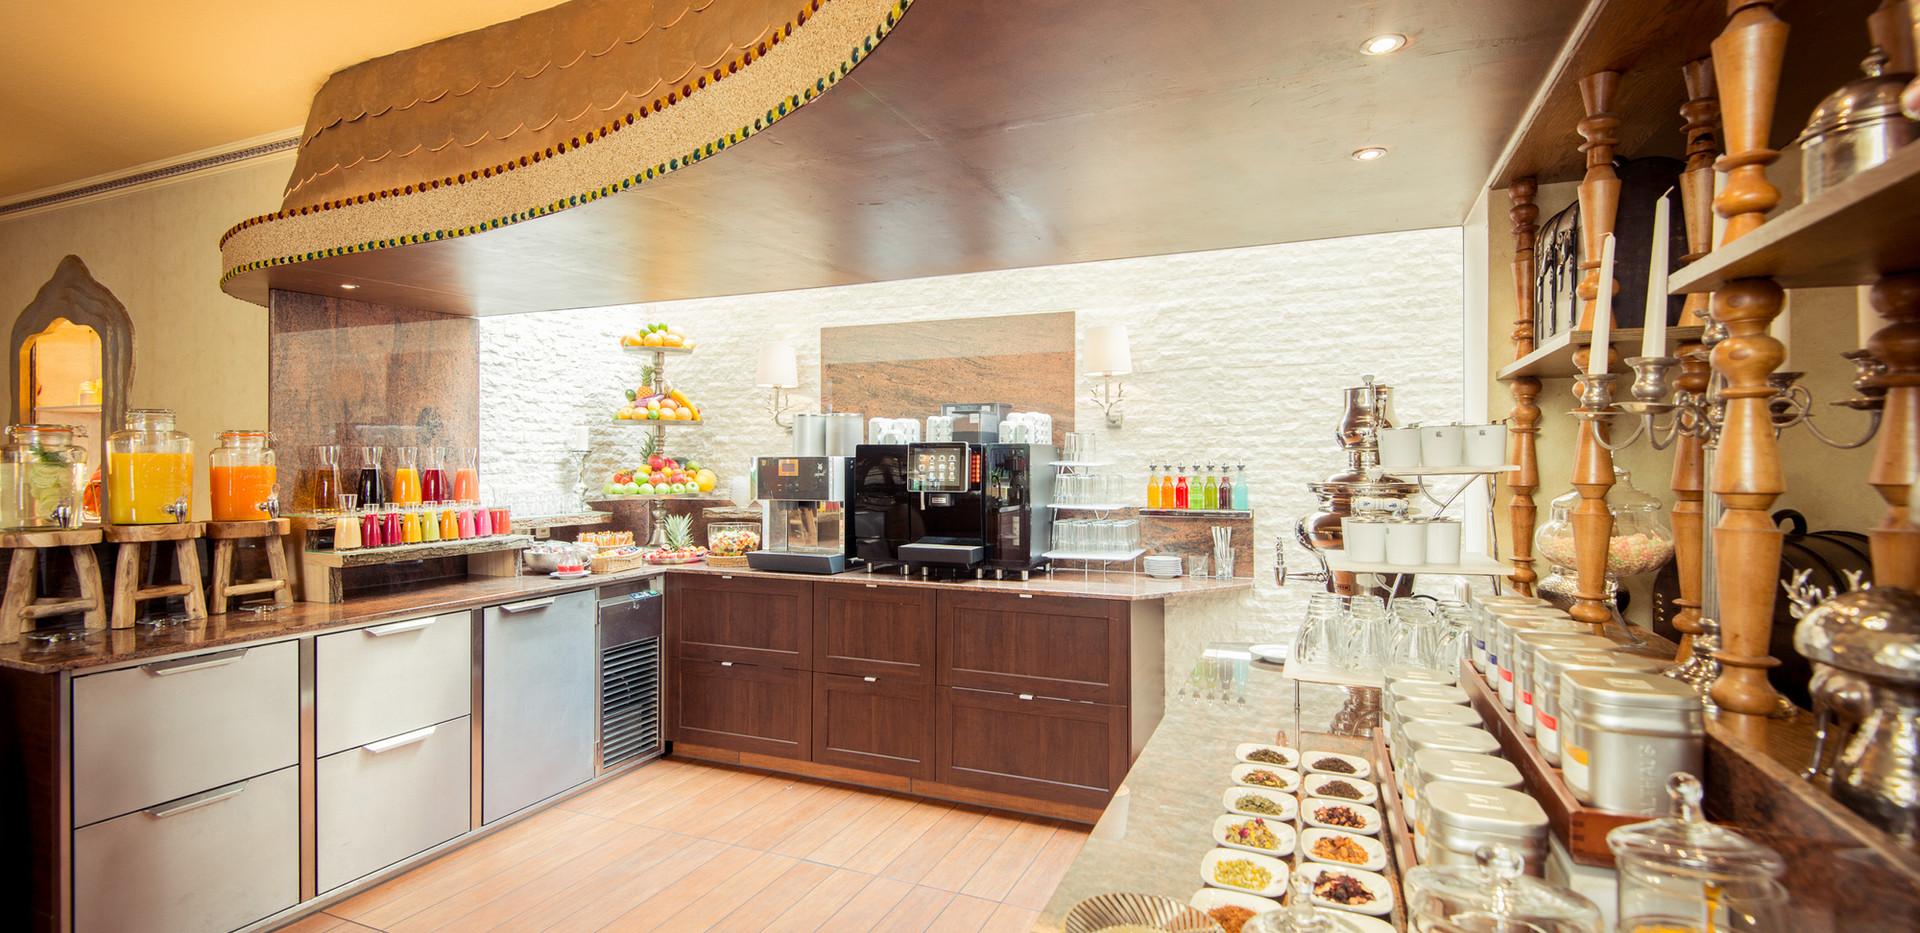 Frühstücks-Manufaktur Restaurant Maxes